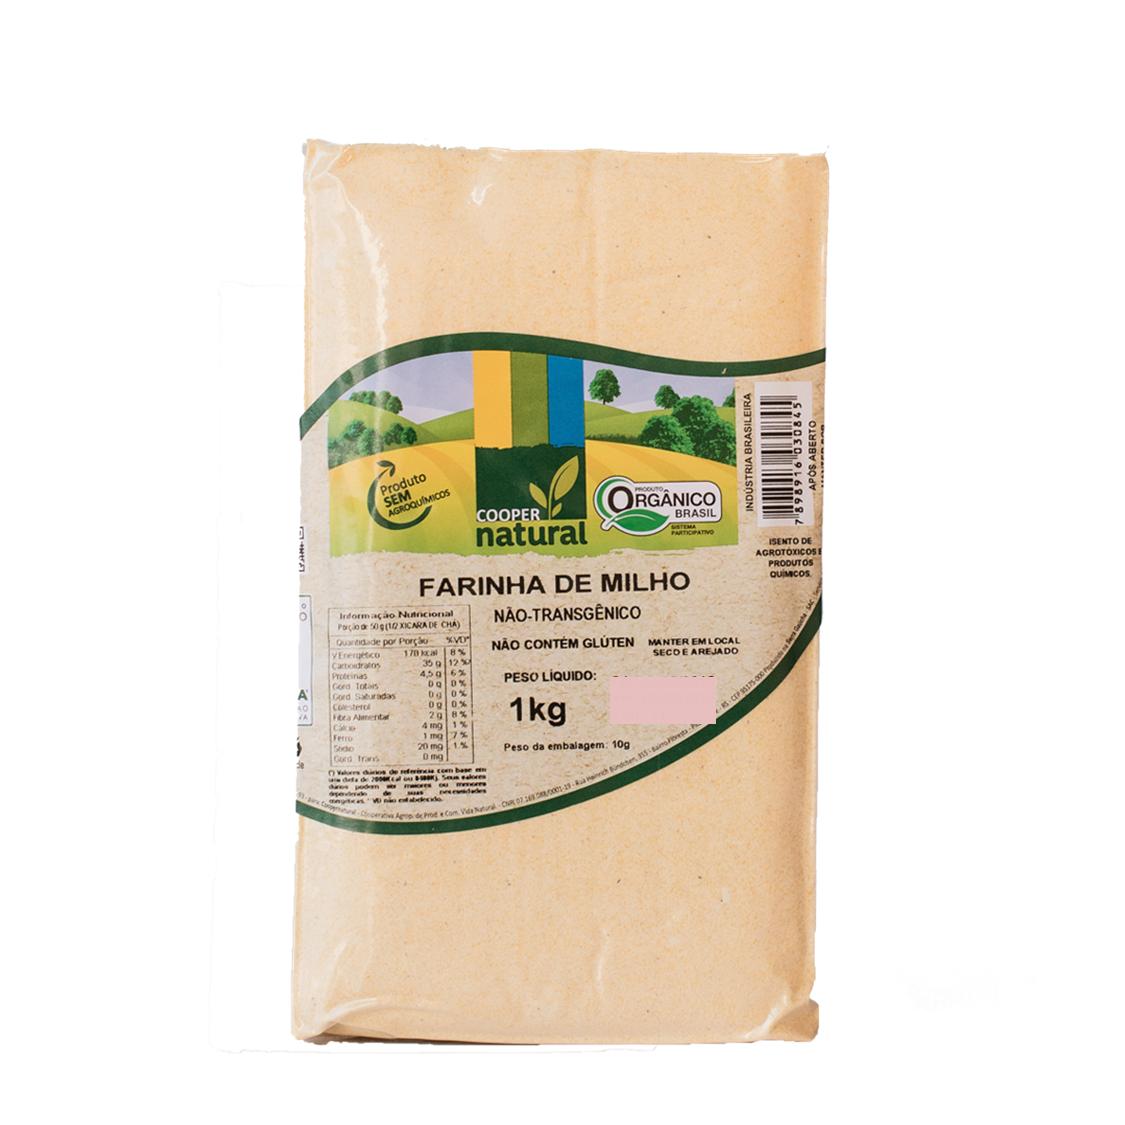 Farinha de Milho (1kg) – Coopernatural